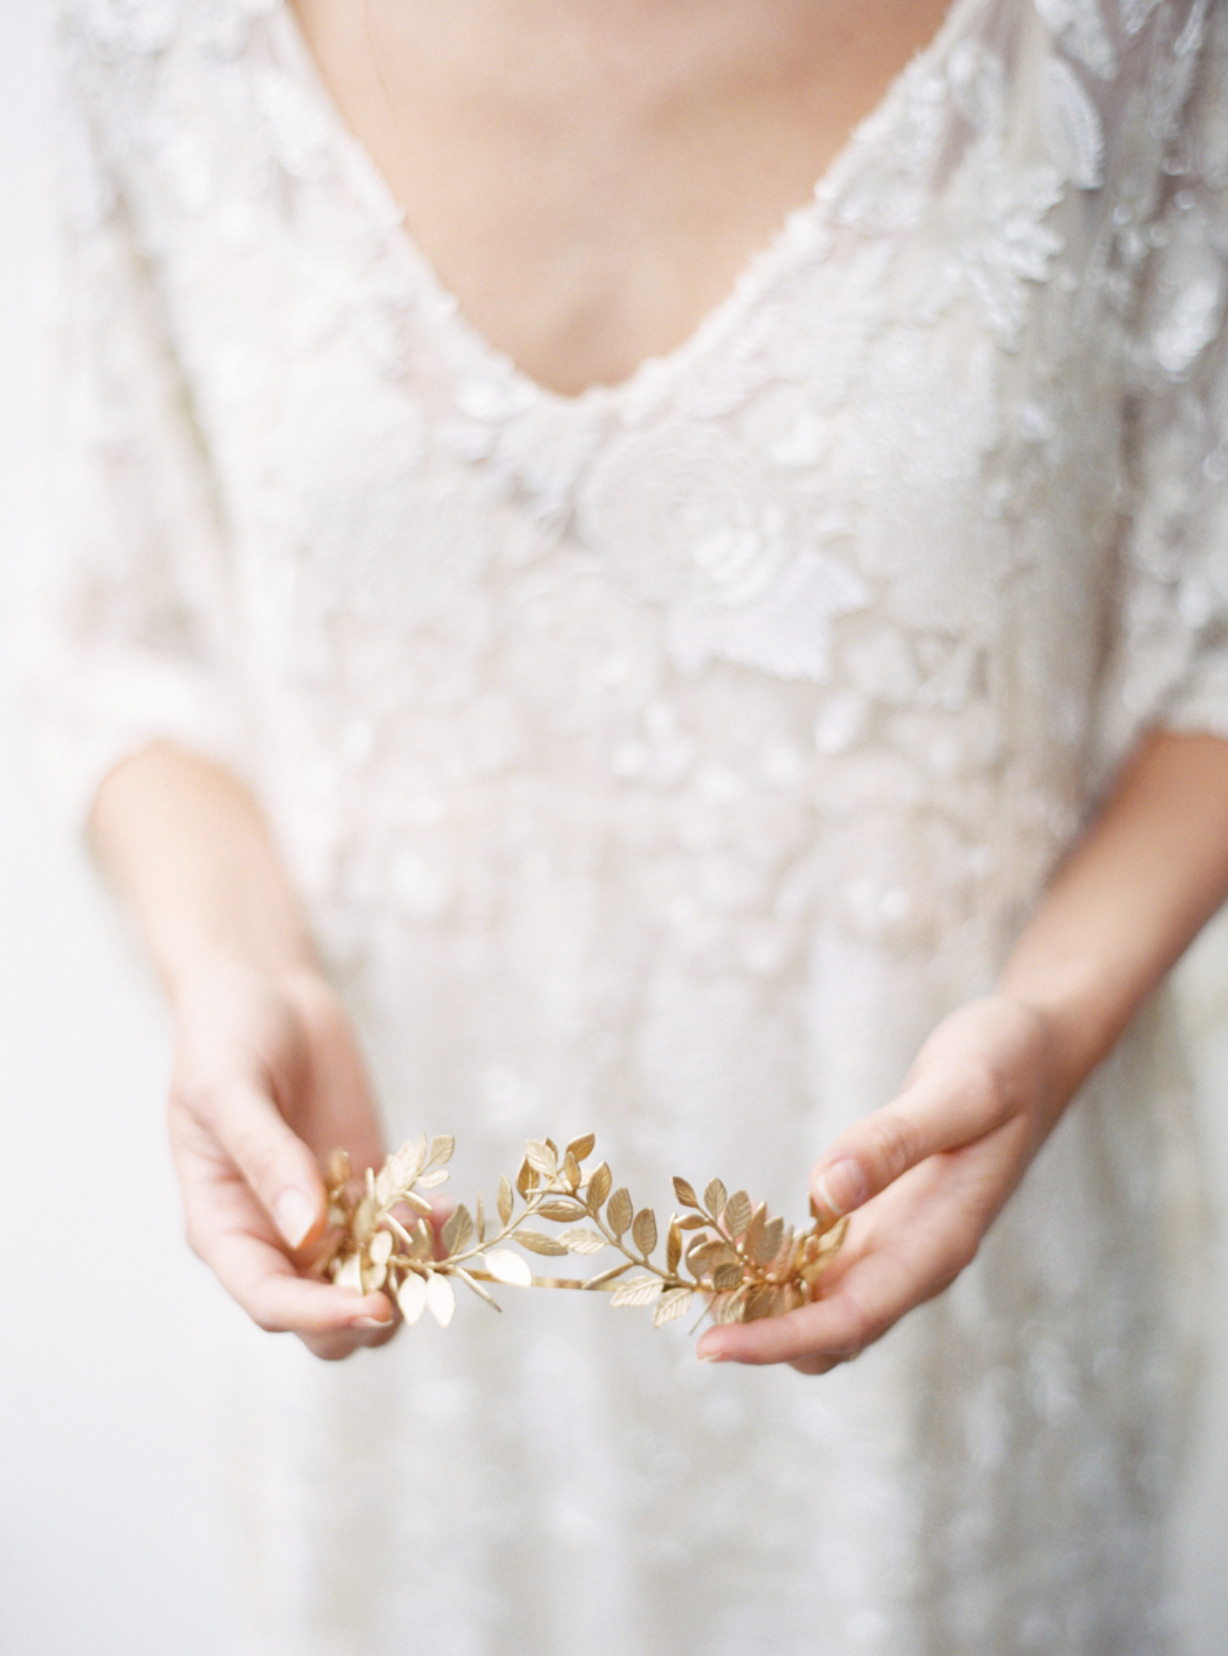 Carol Hannah Bridal Iolite Gown Shanon Moffit Photography 3.png